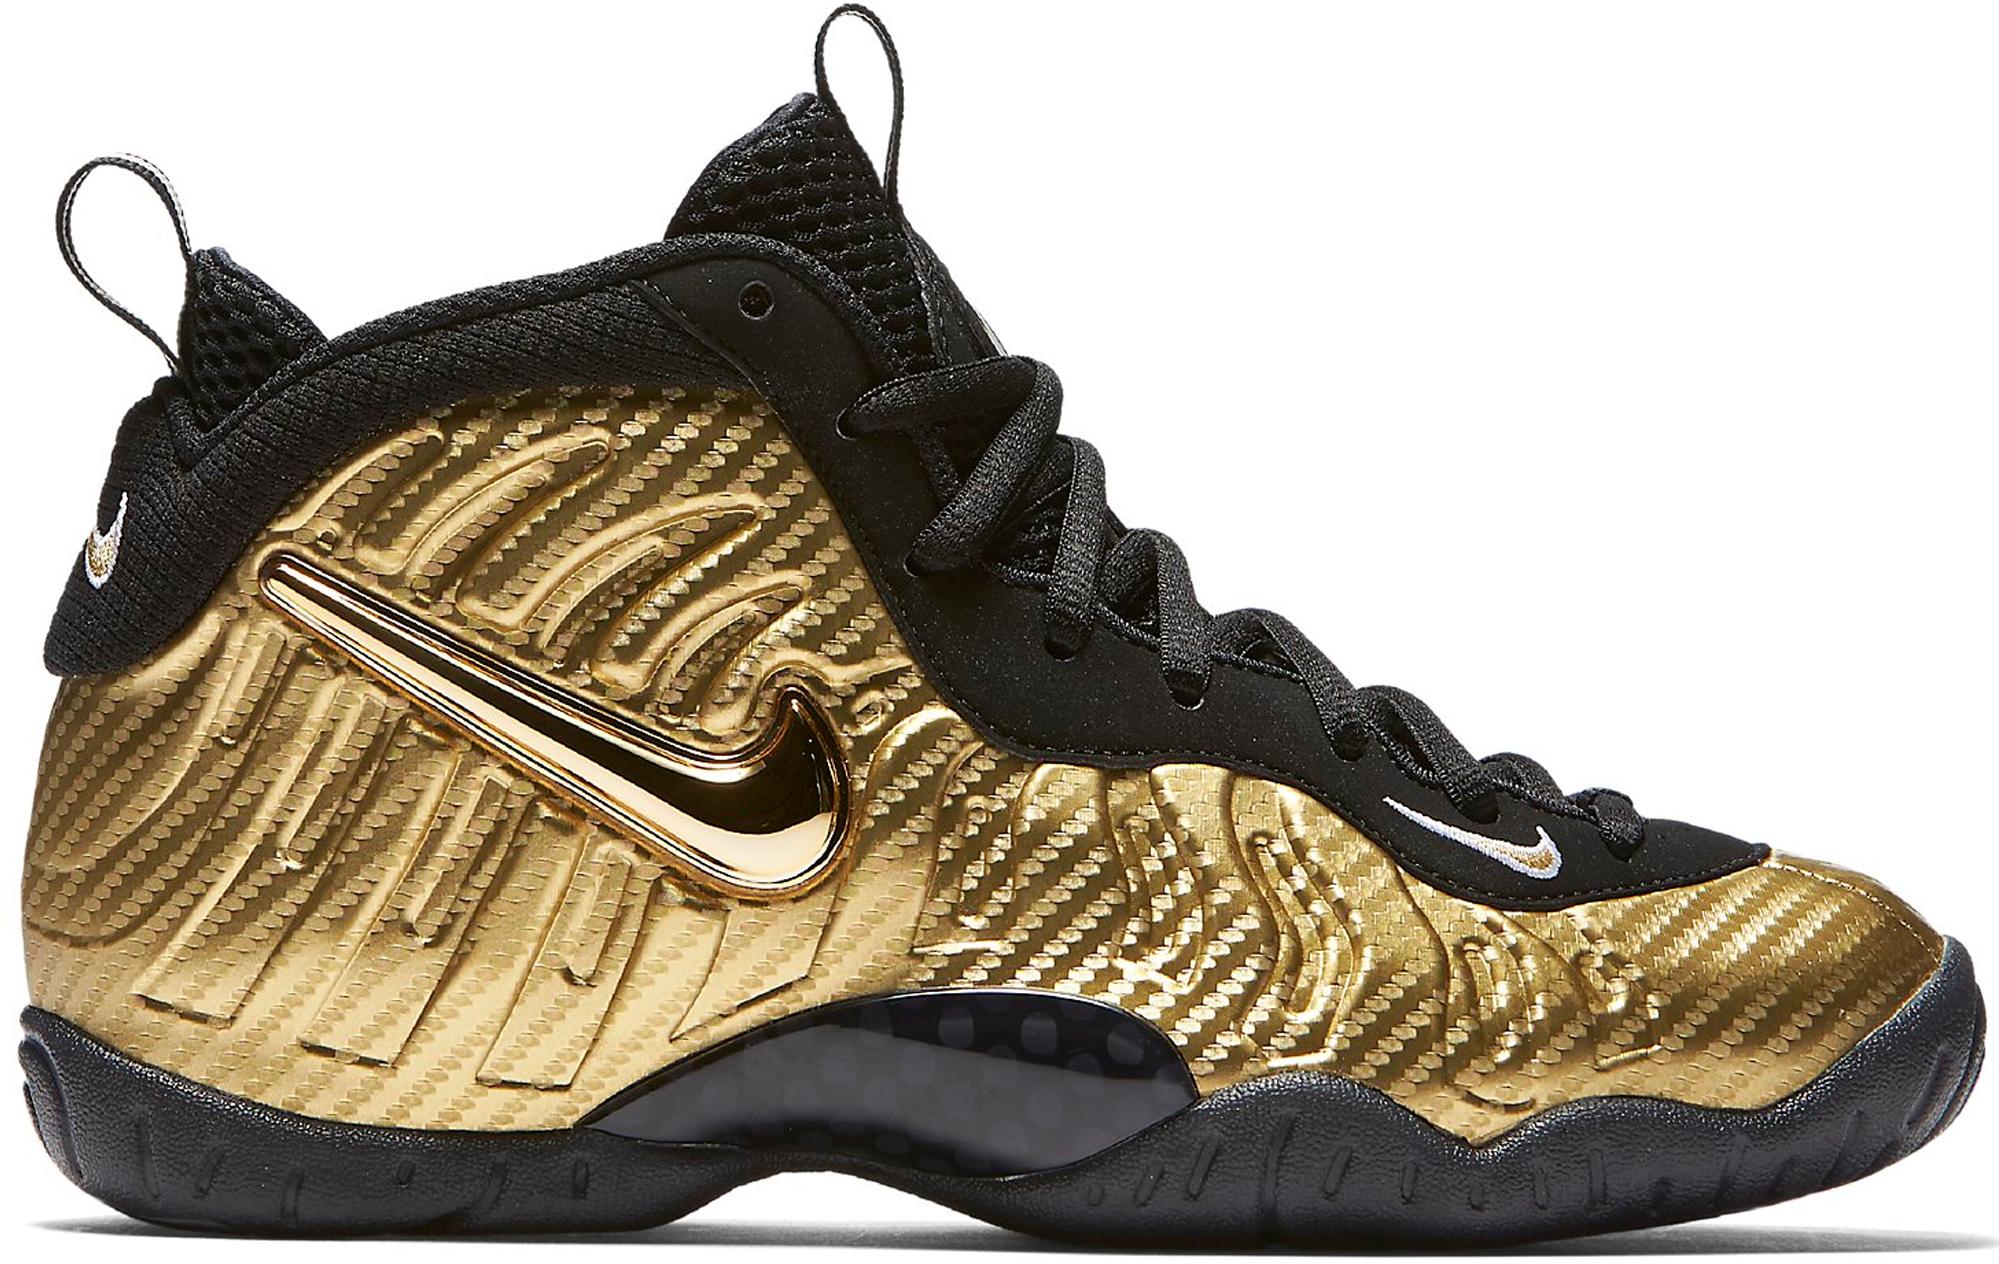 Air Nike Foamposite Pro Metallic Gold (GS)